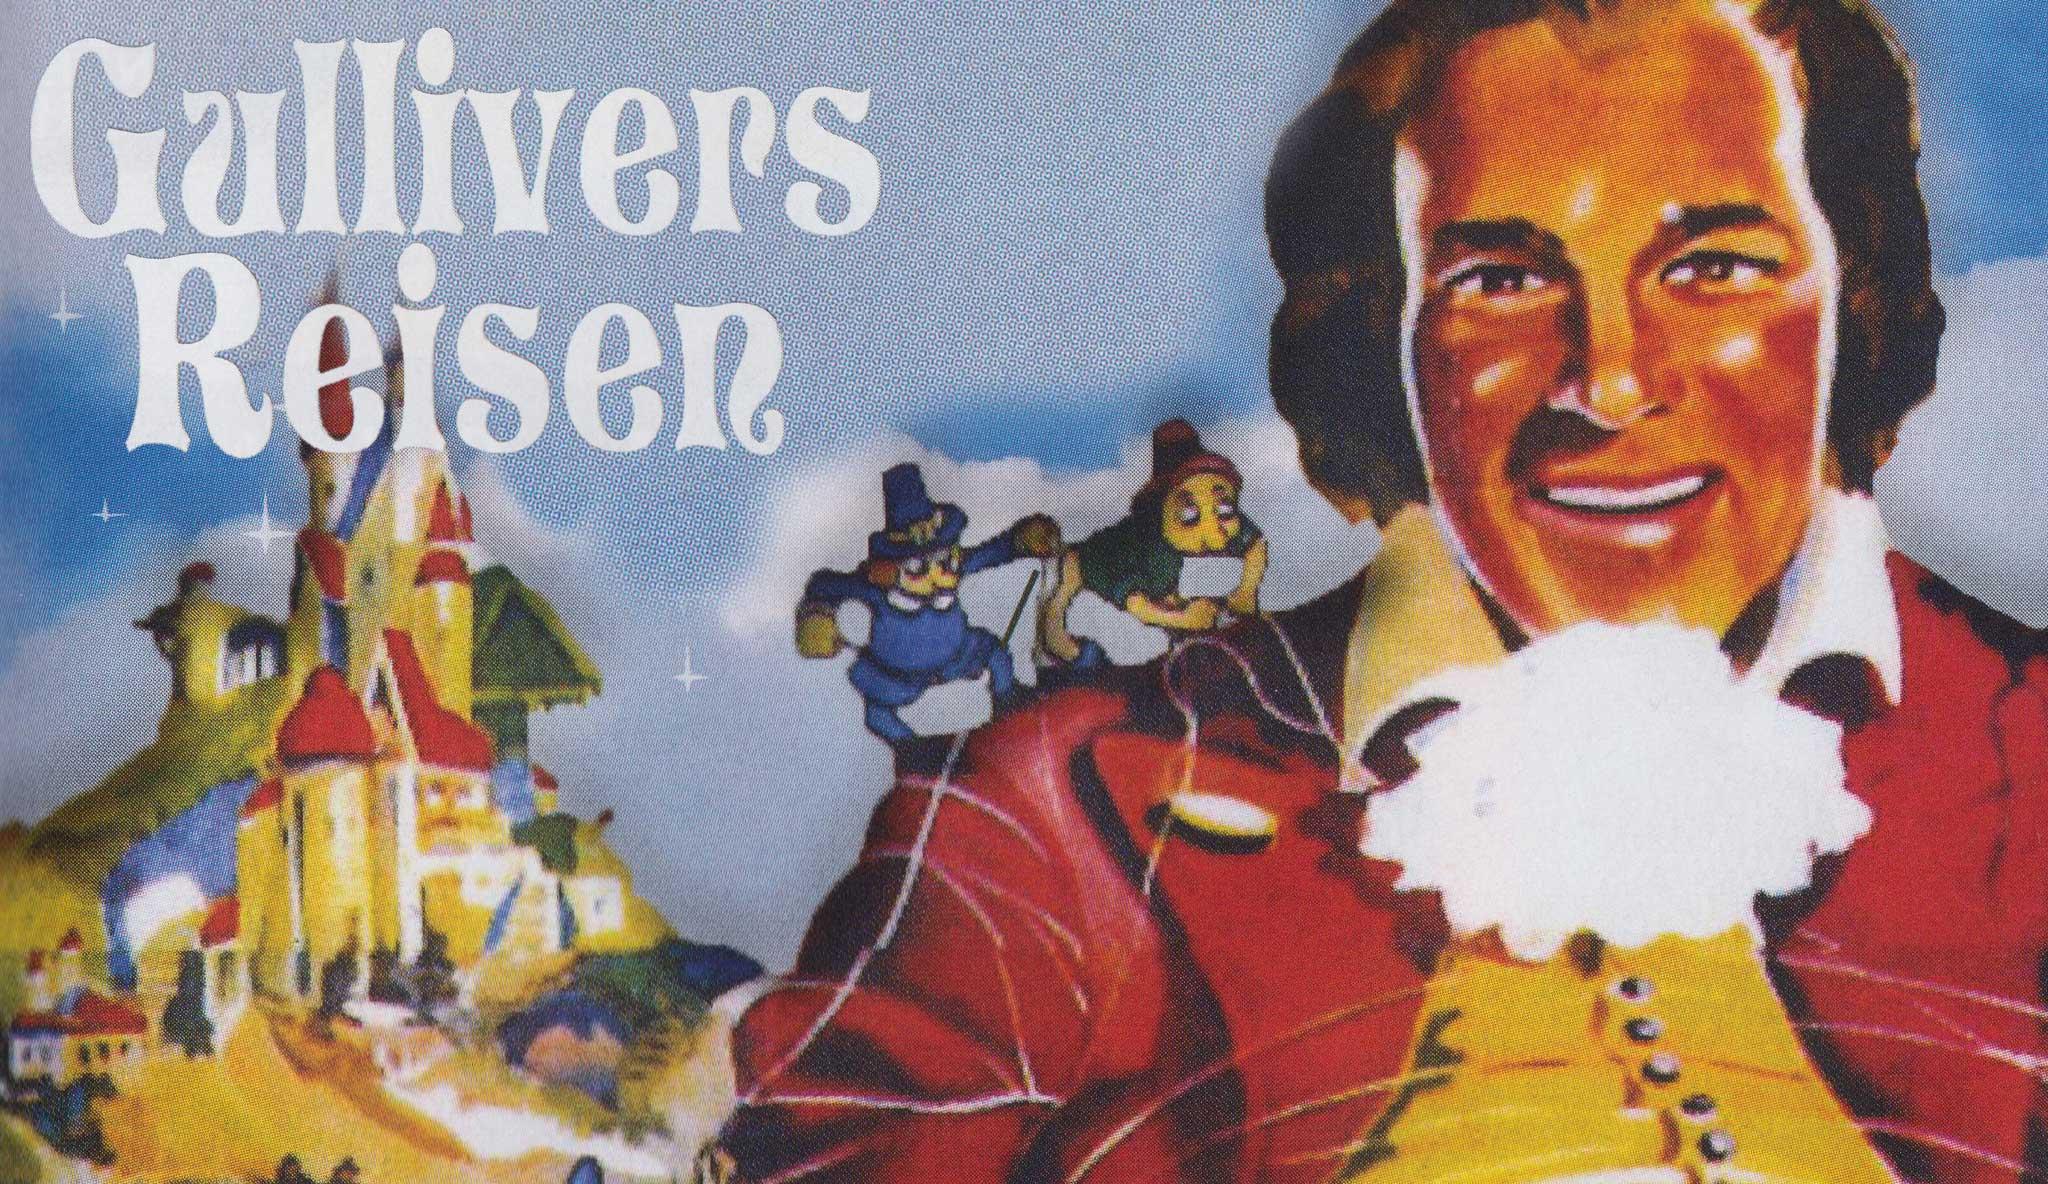 gullivers-reisen\header.jpg